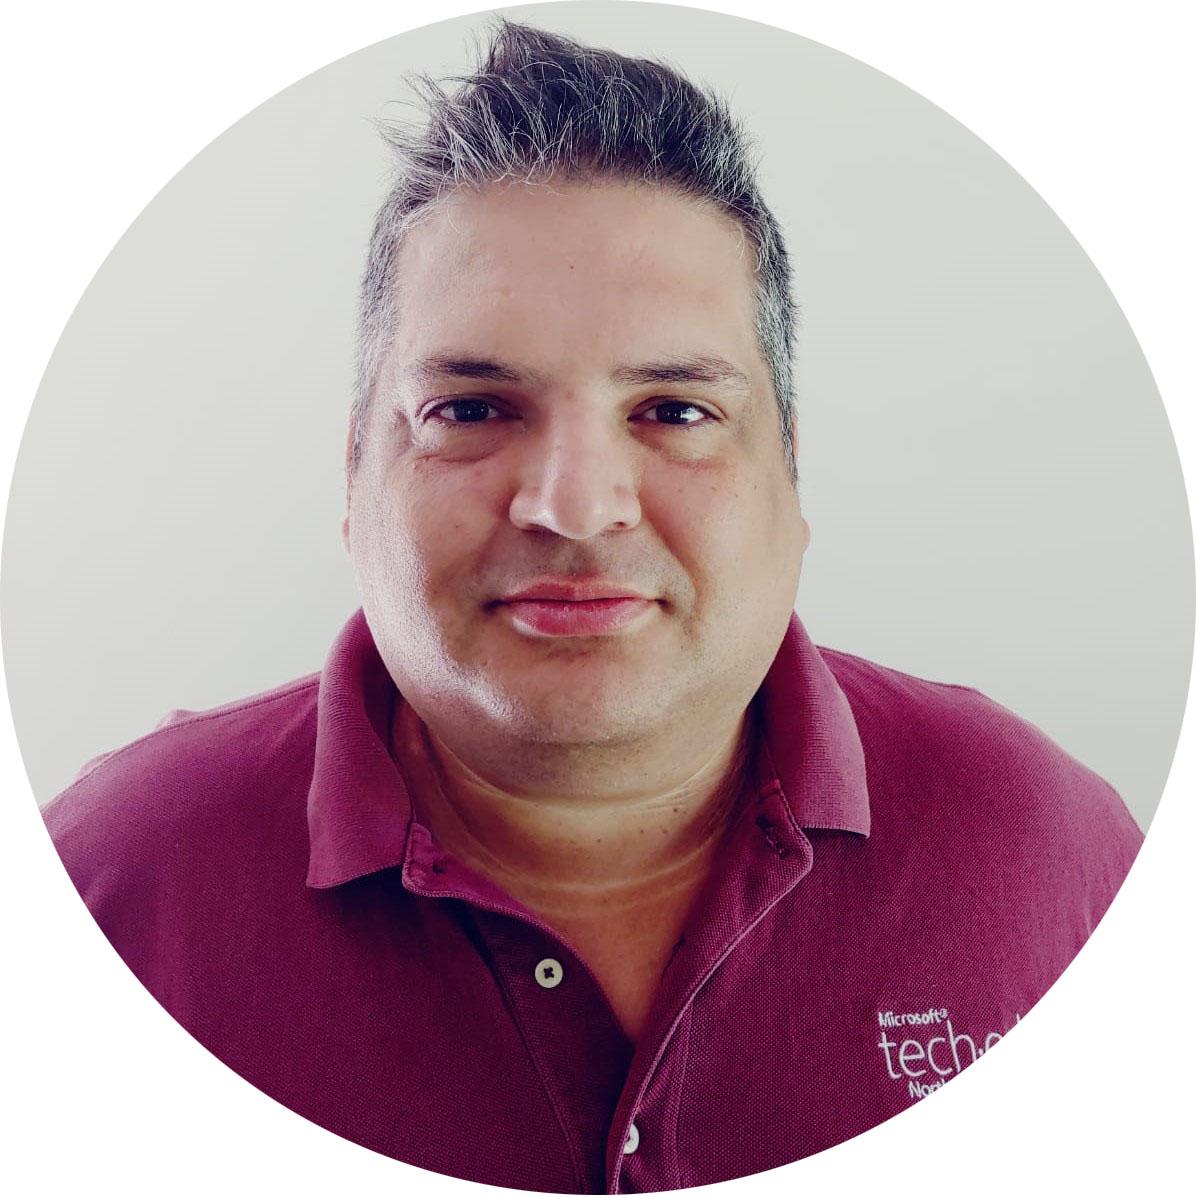 Roberto DL